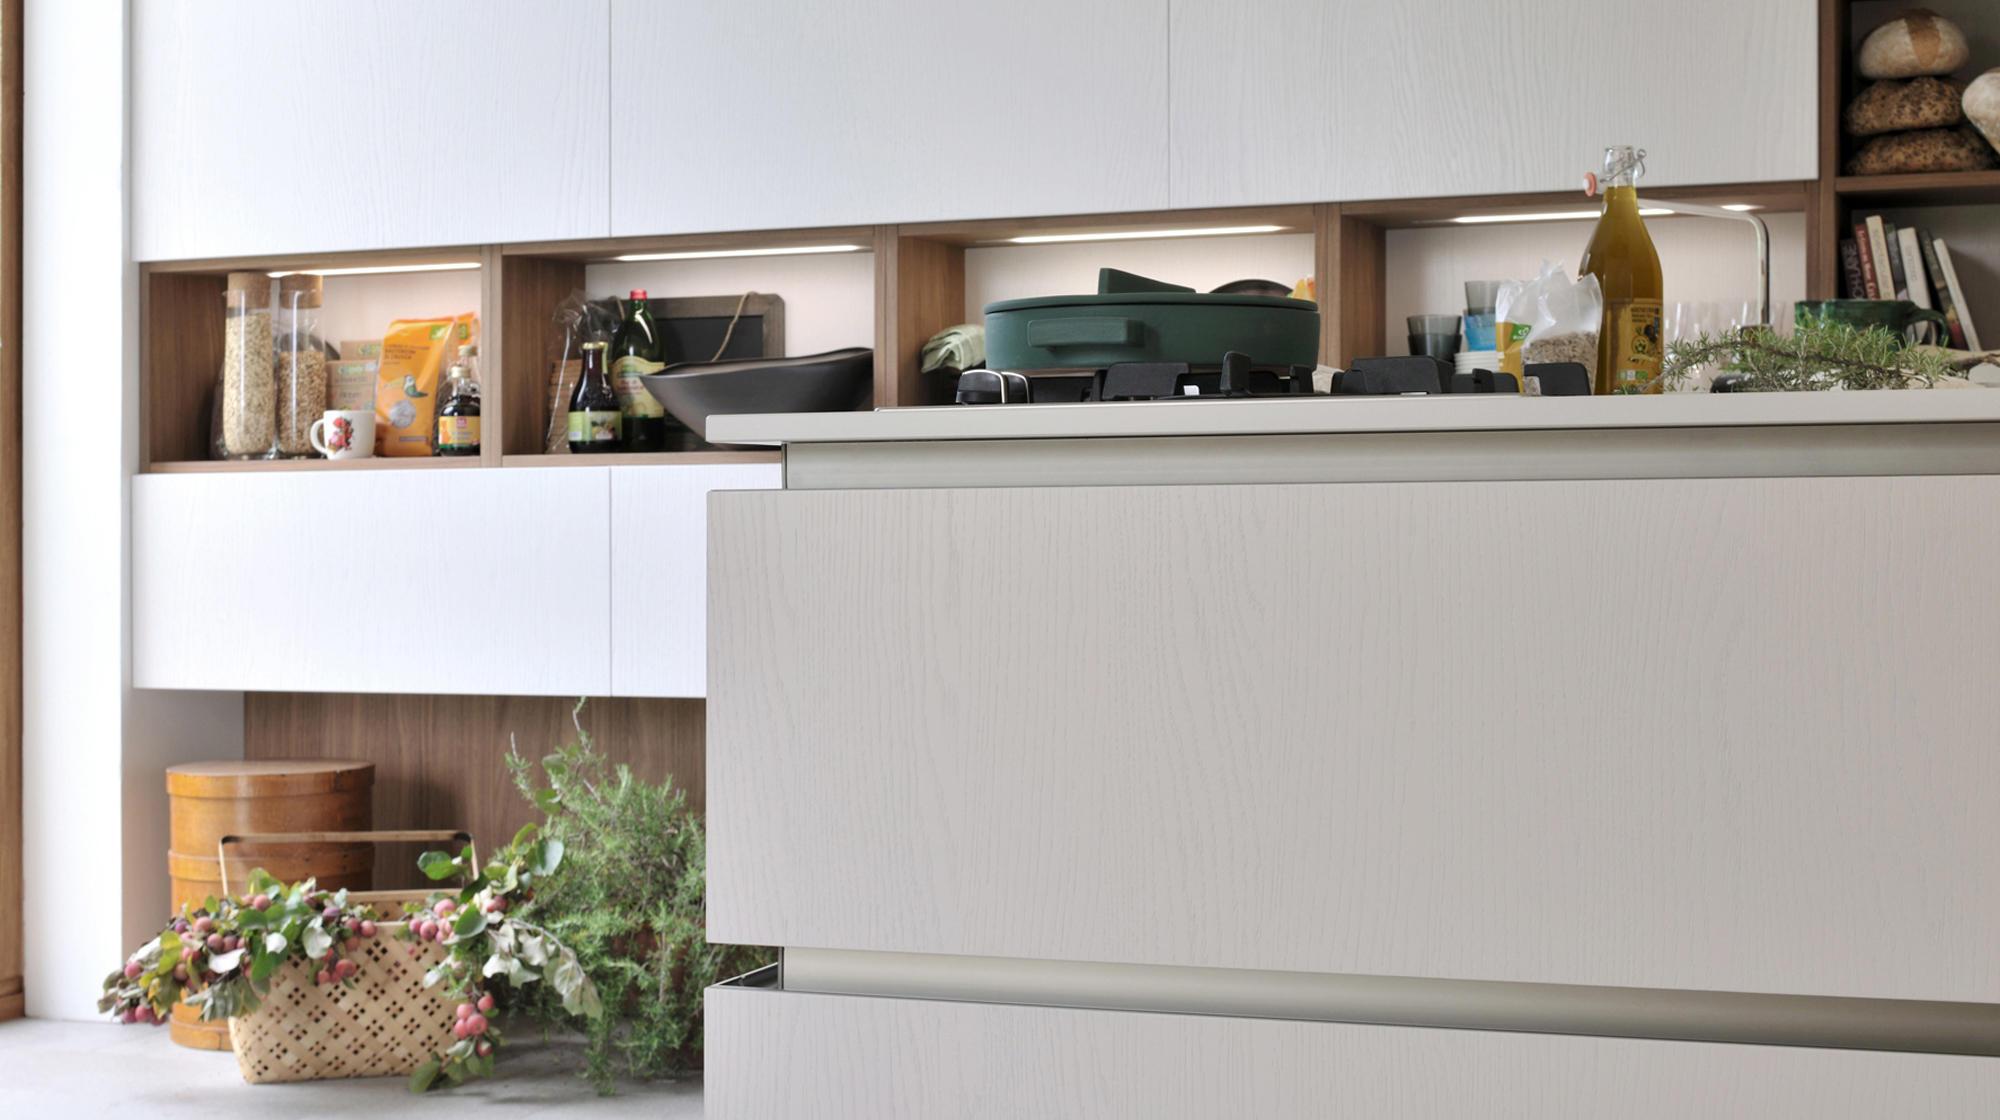 Stunning Veneta Cucina Oyster Images - Acomo.us - acomo.us